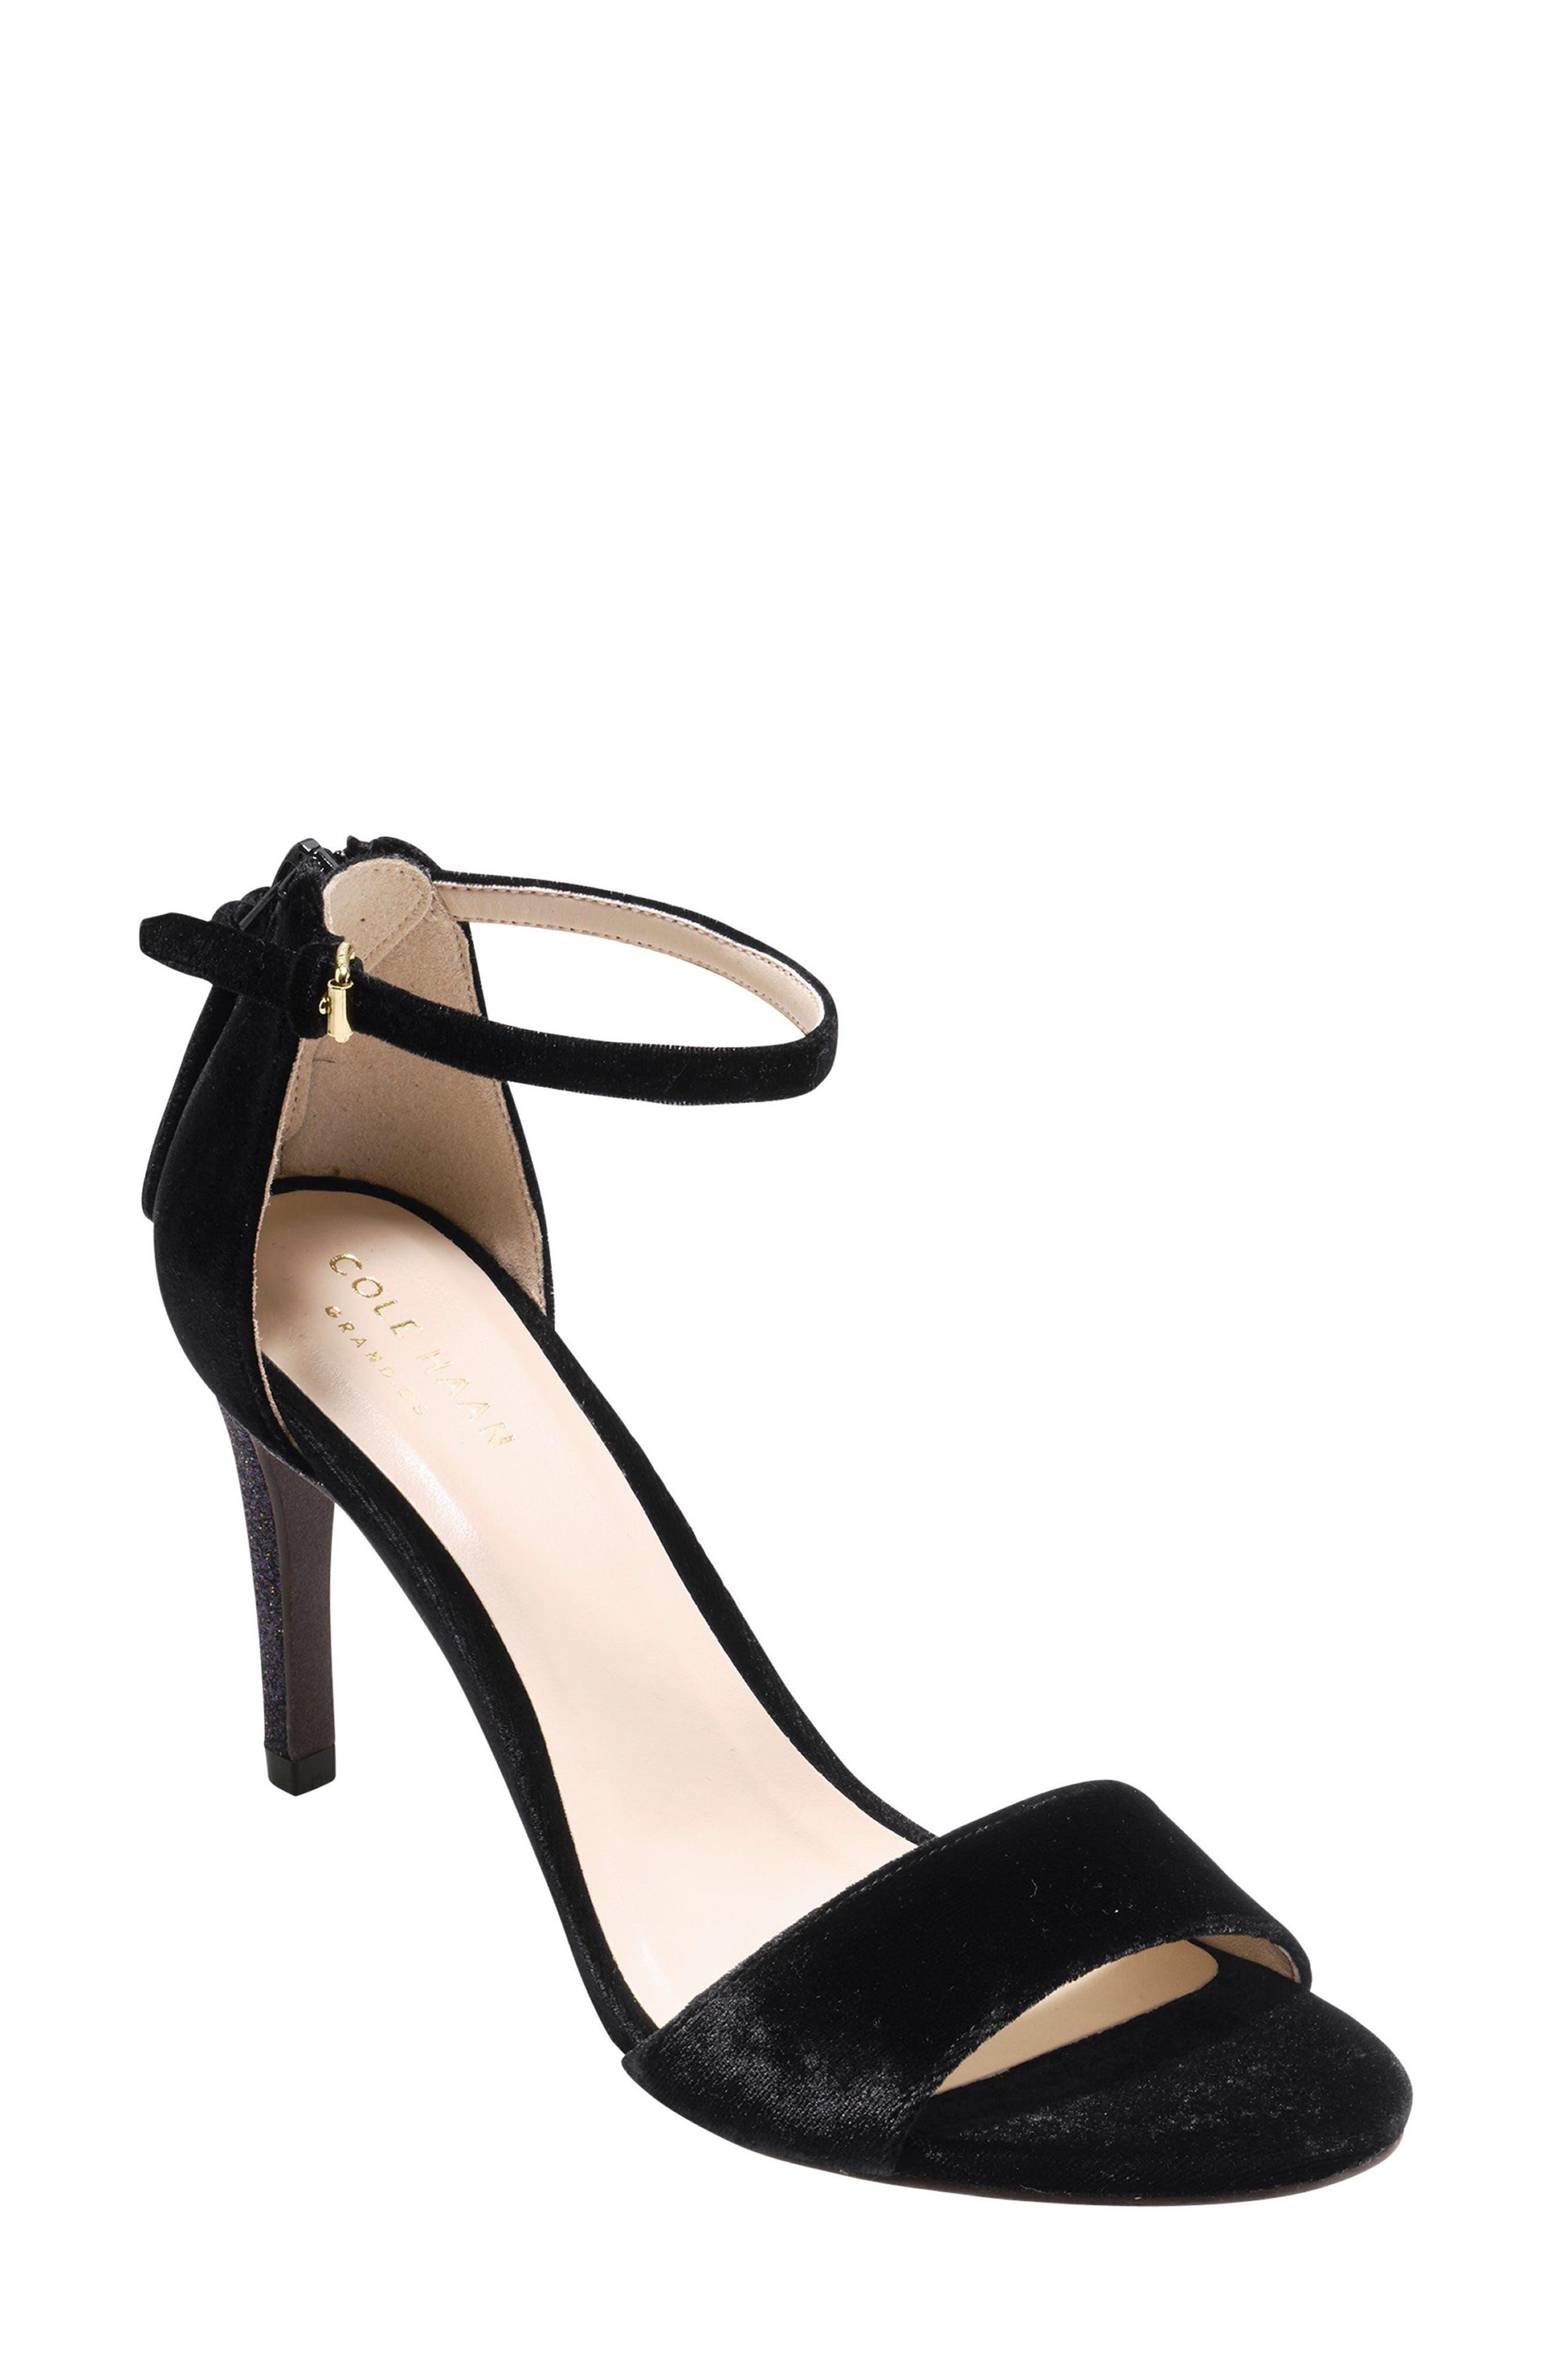 Clara Grand Ankle Strap Sandal,                             Main thumbnail 1, color,                             001